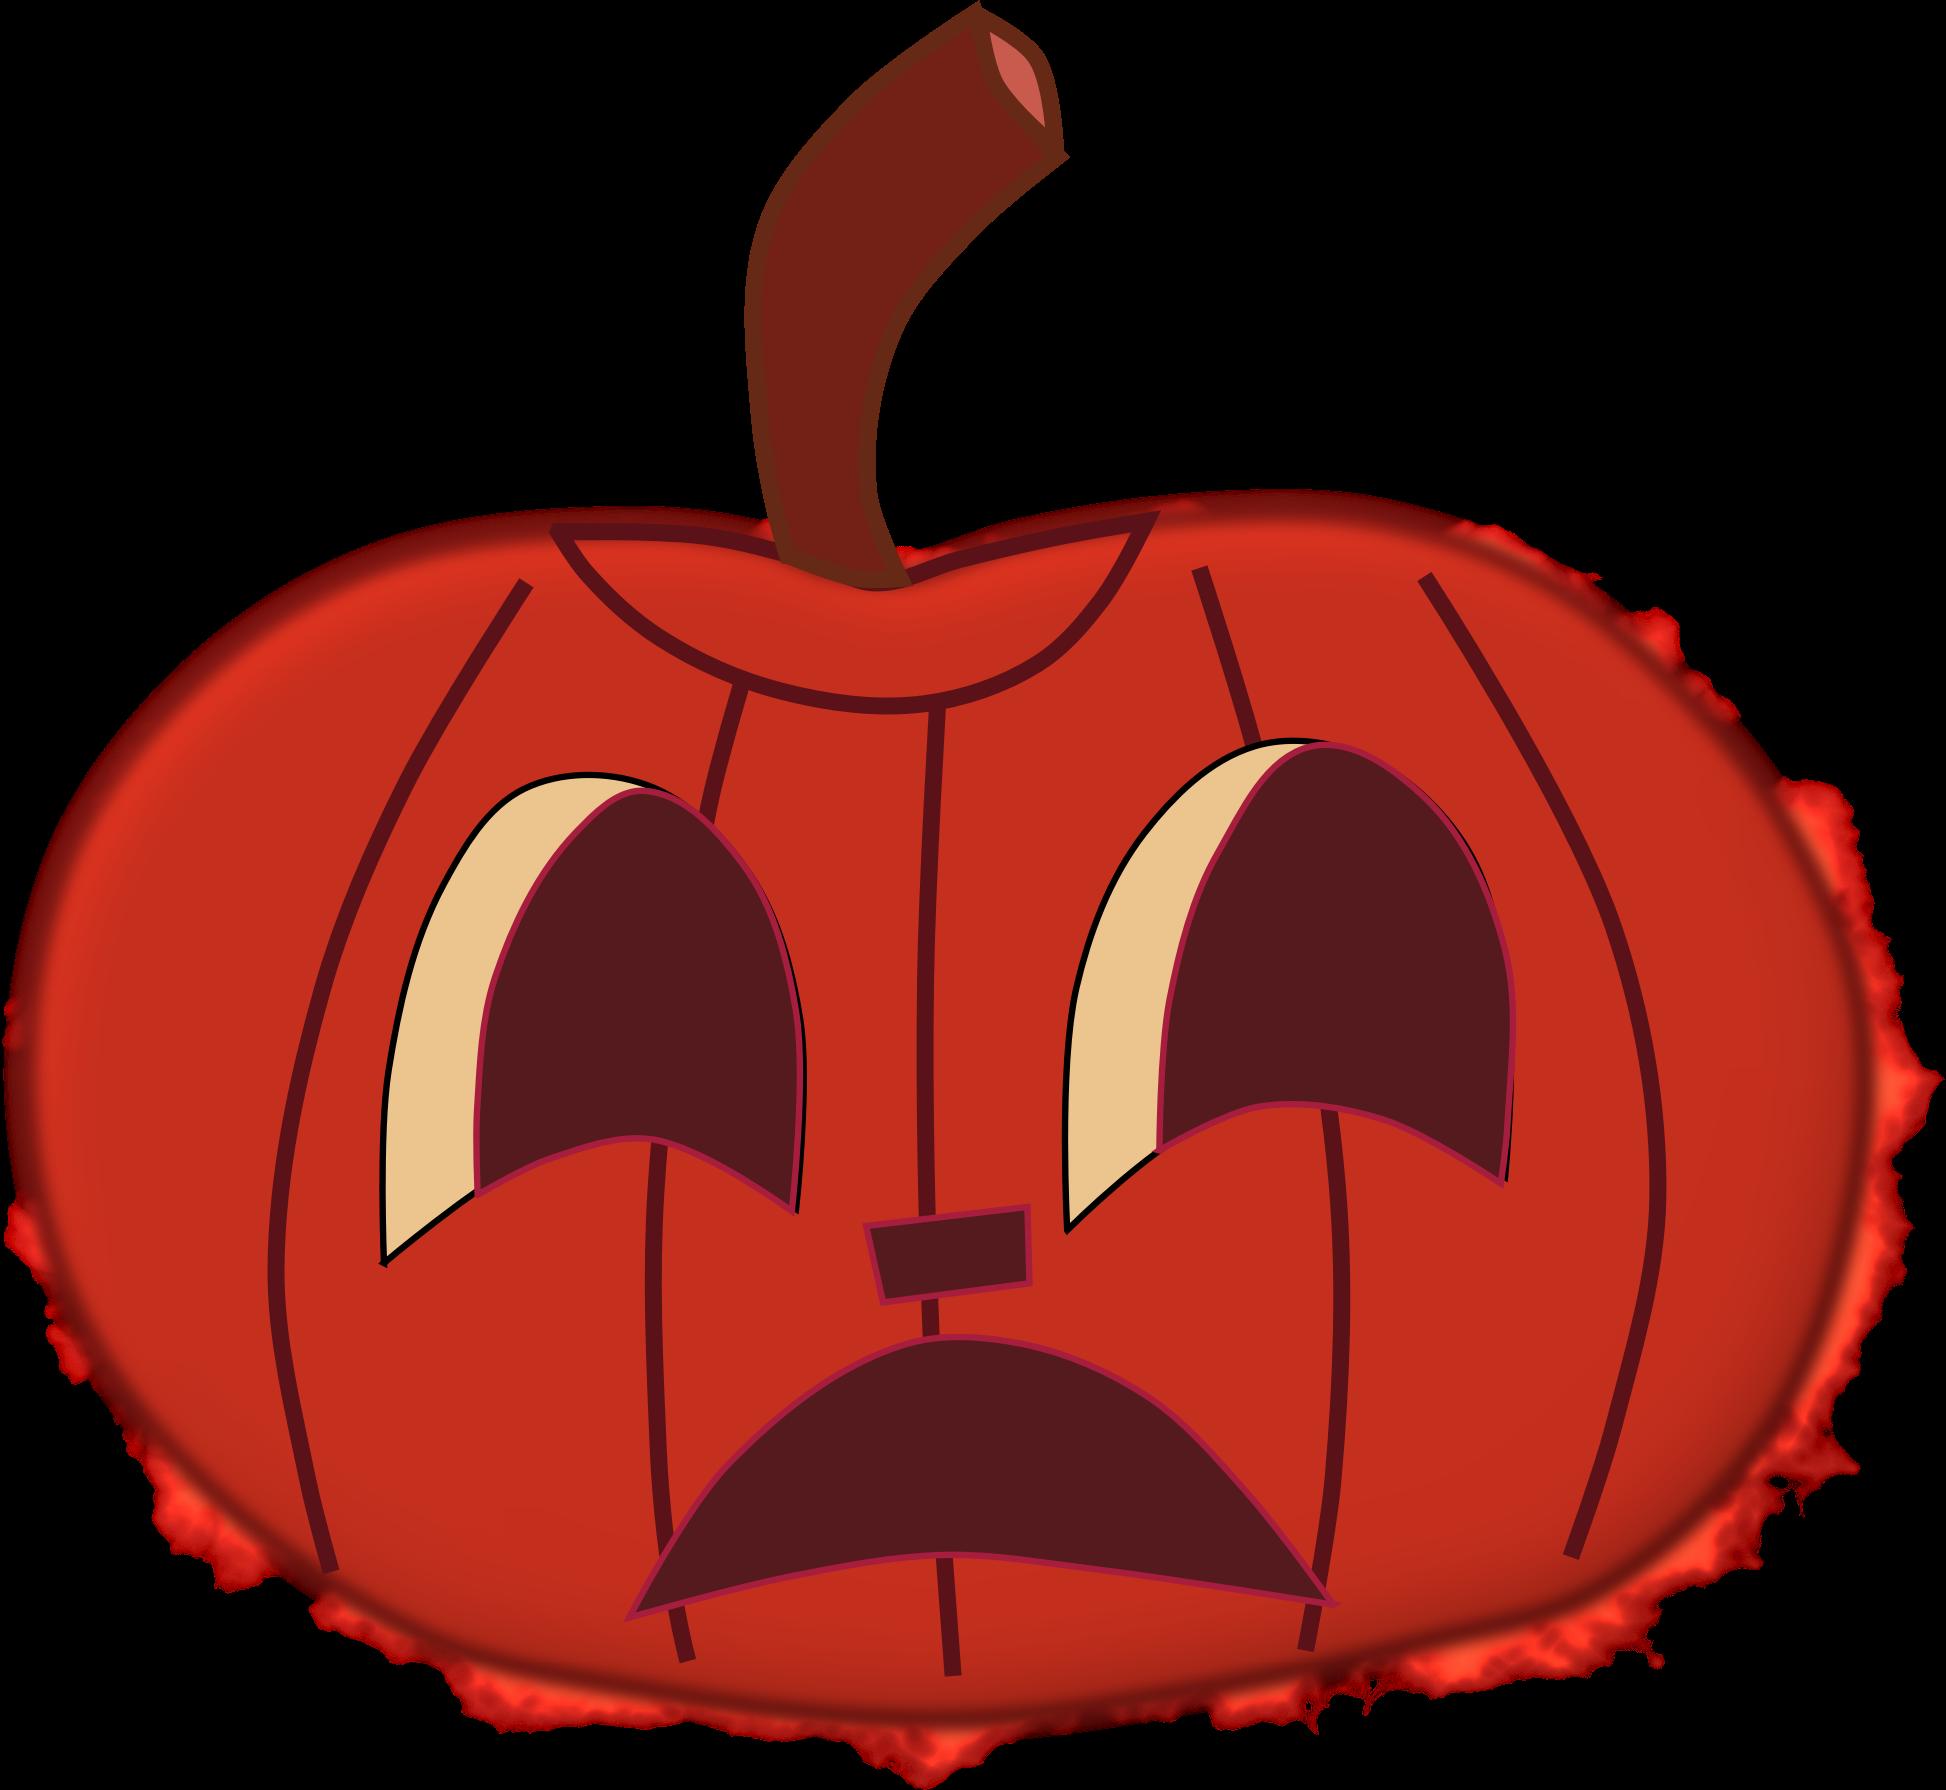 Pumpkin train clipart black and white library Clipart - Halloween faces for pumpkins, orange black and white library